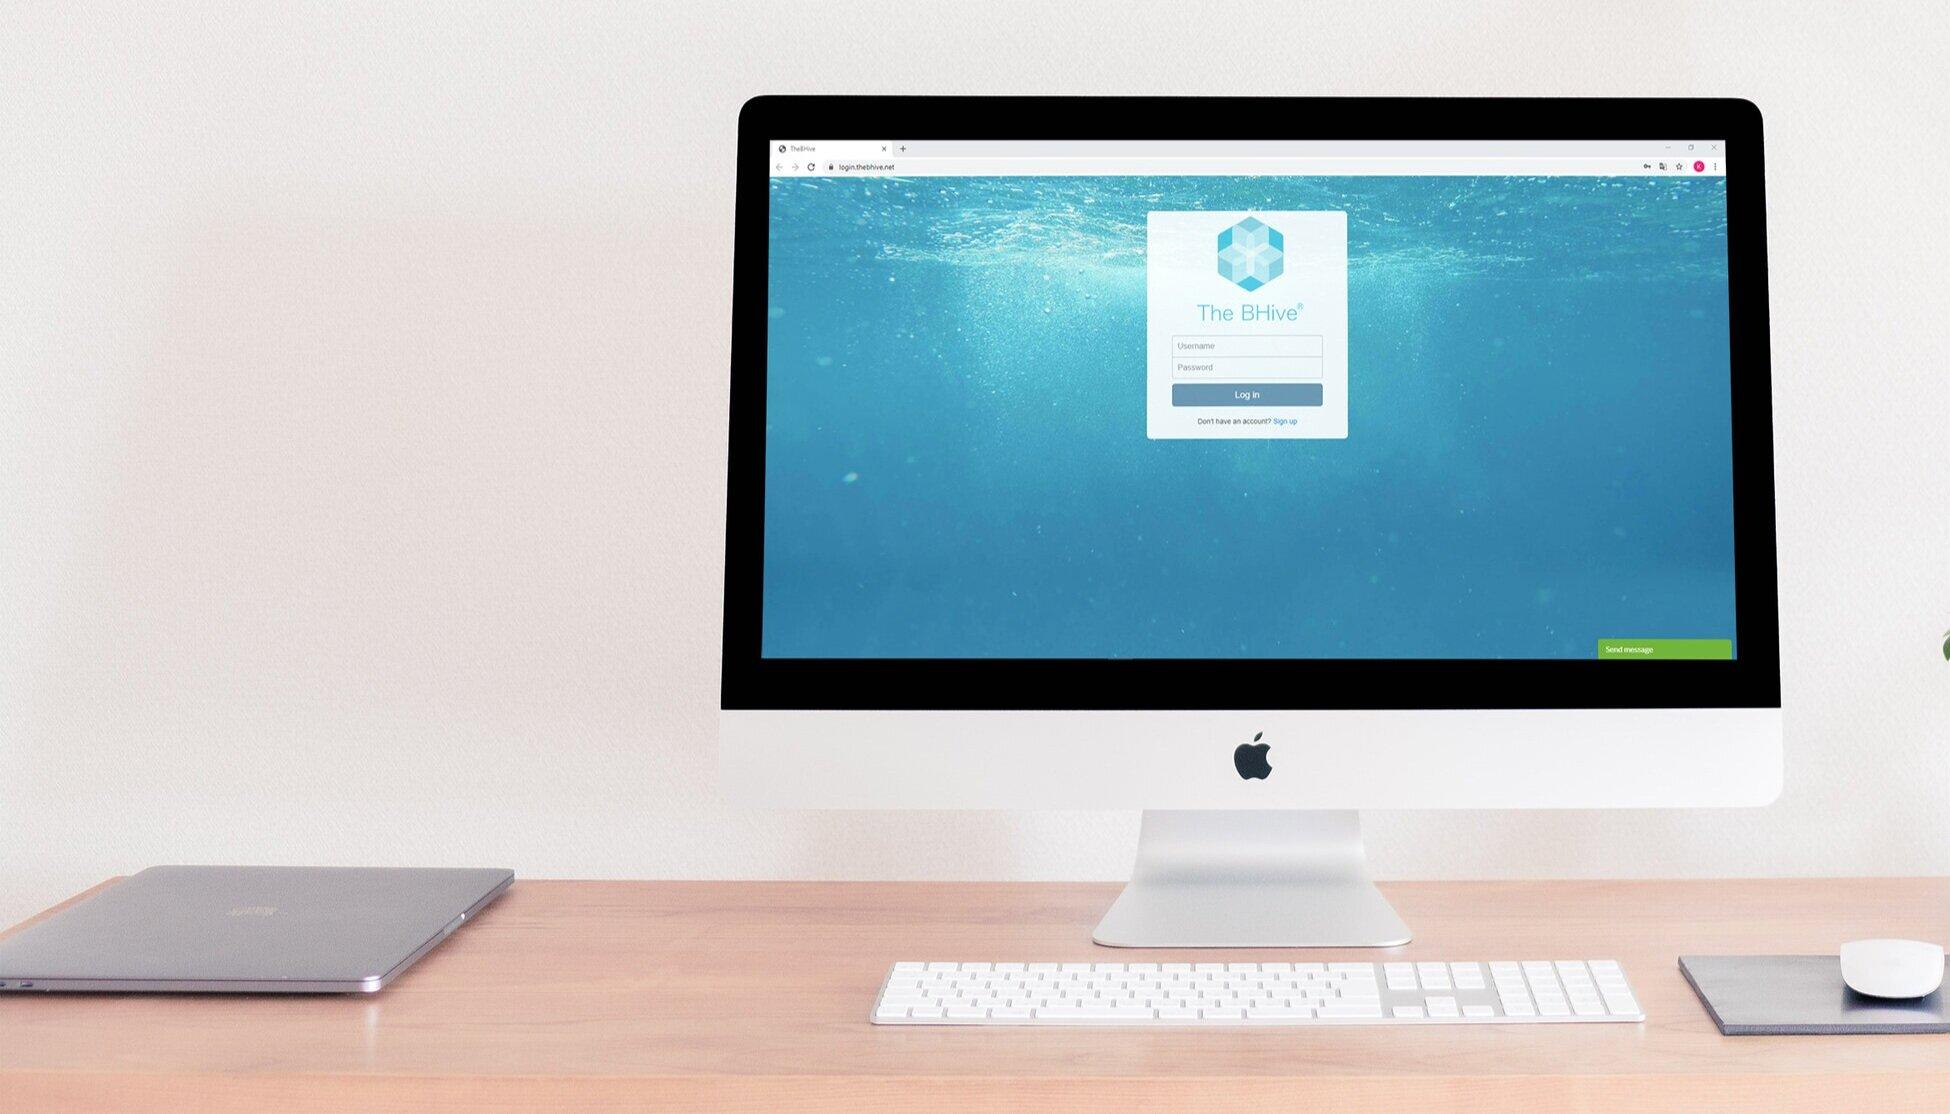 Mac+Screen+The+BHive.jpg